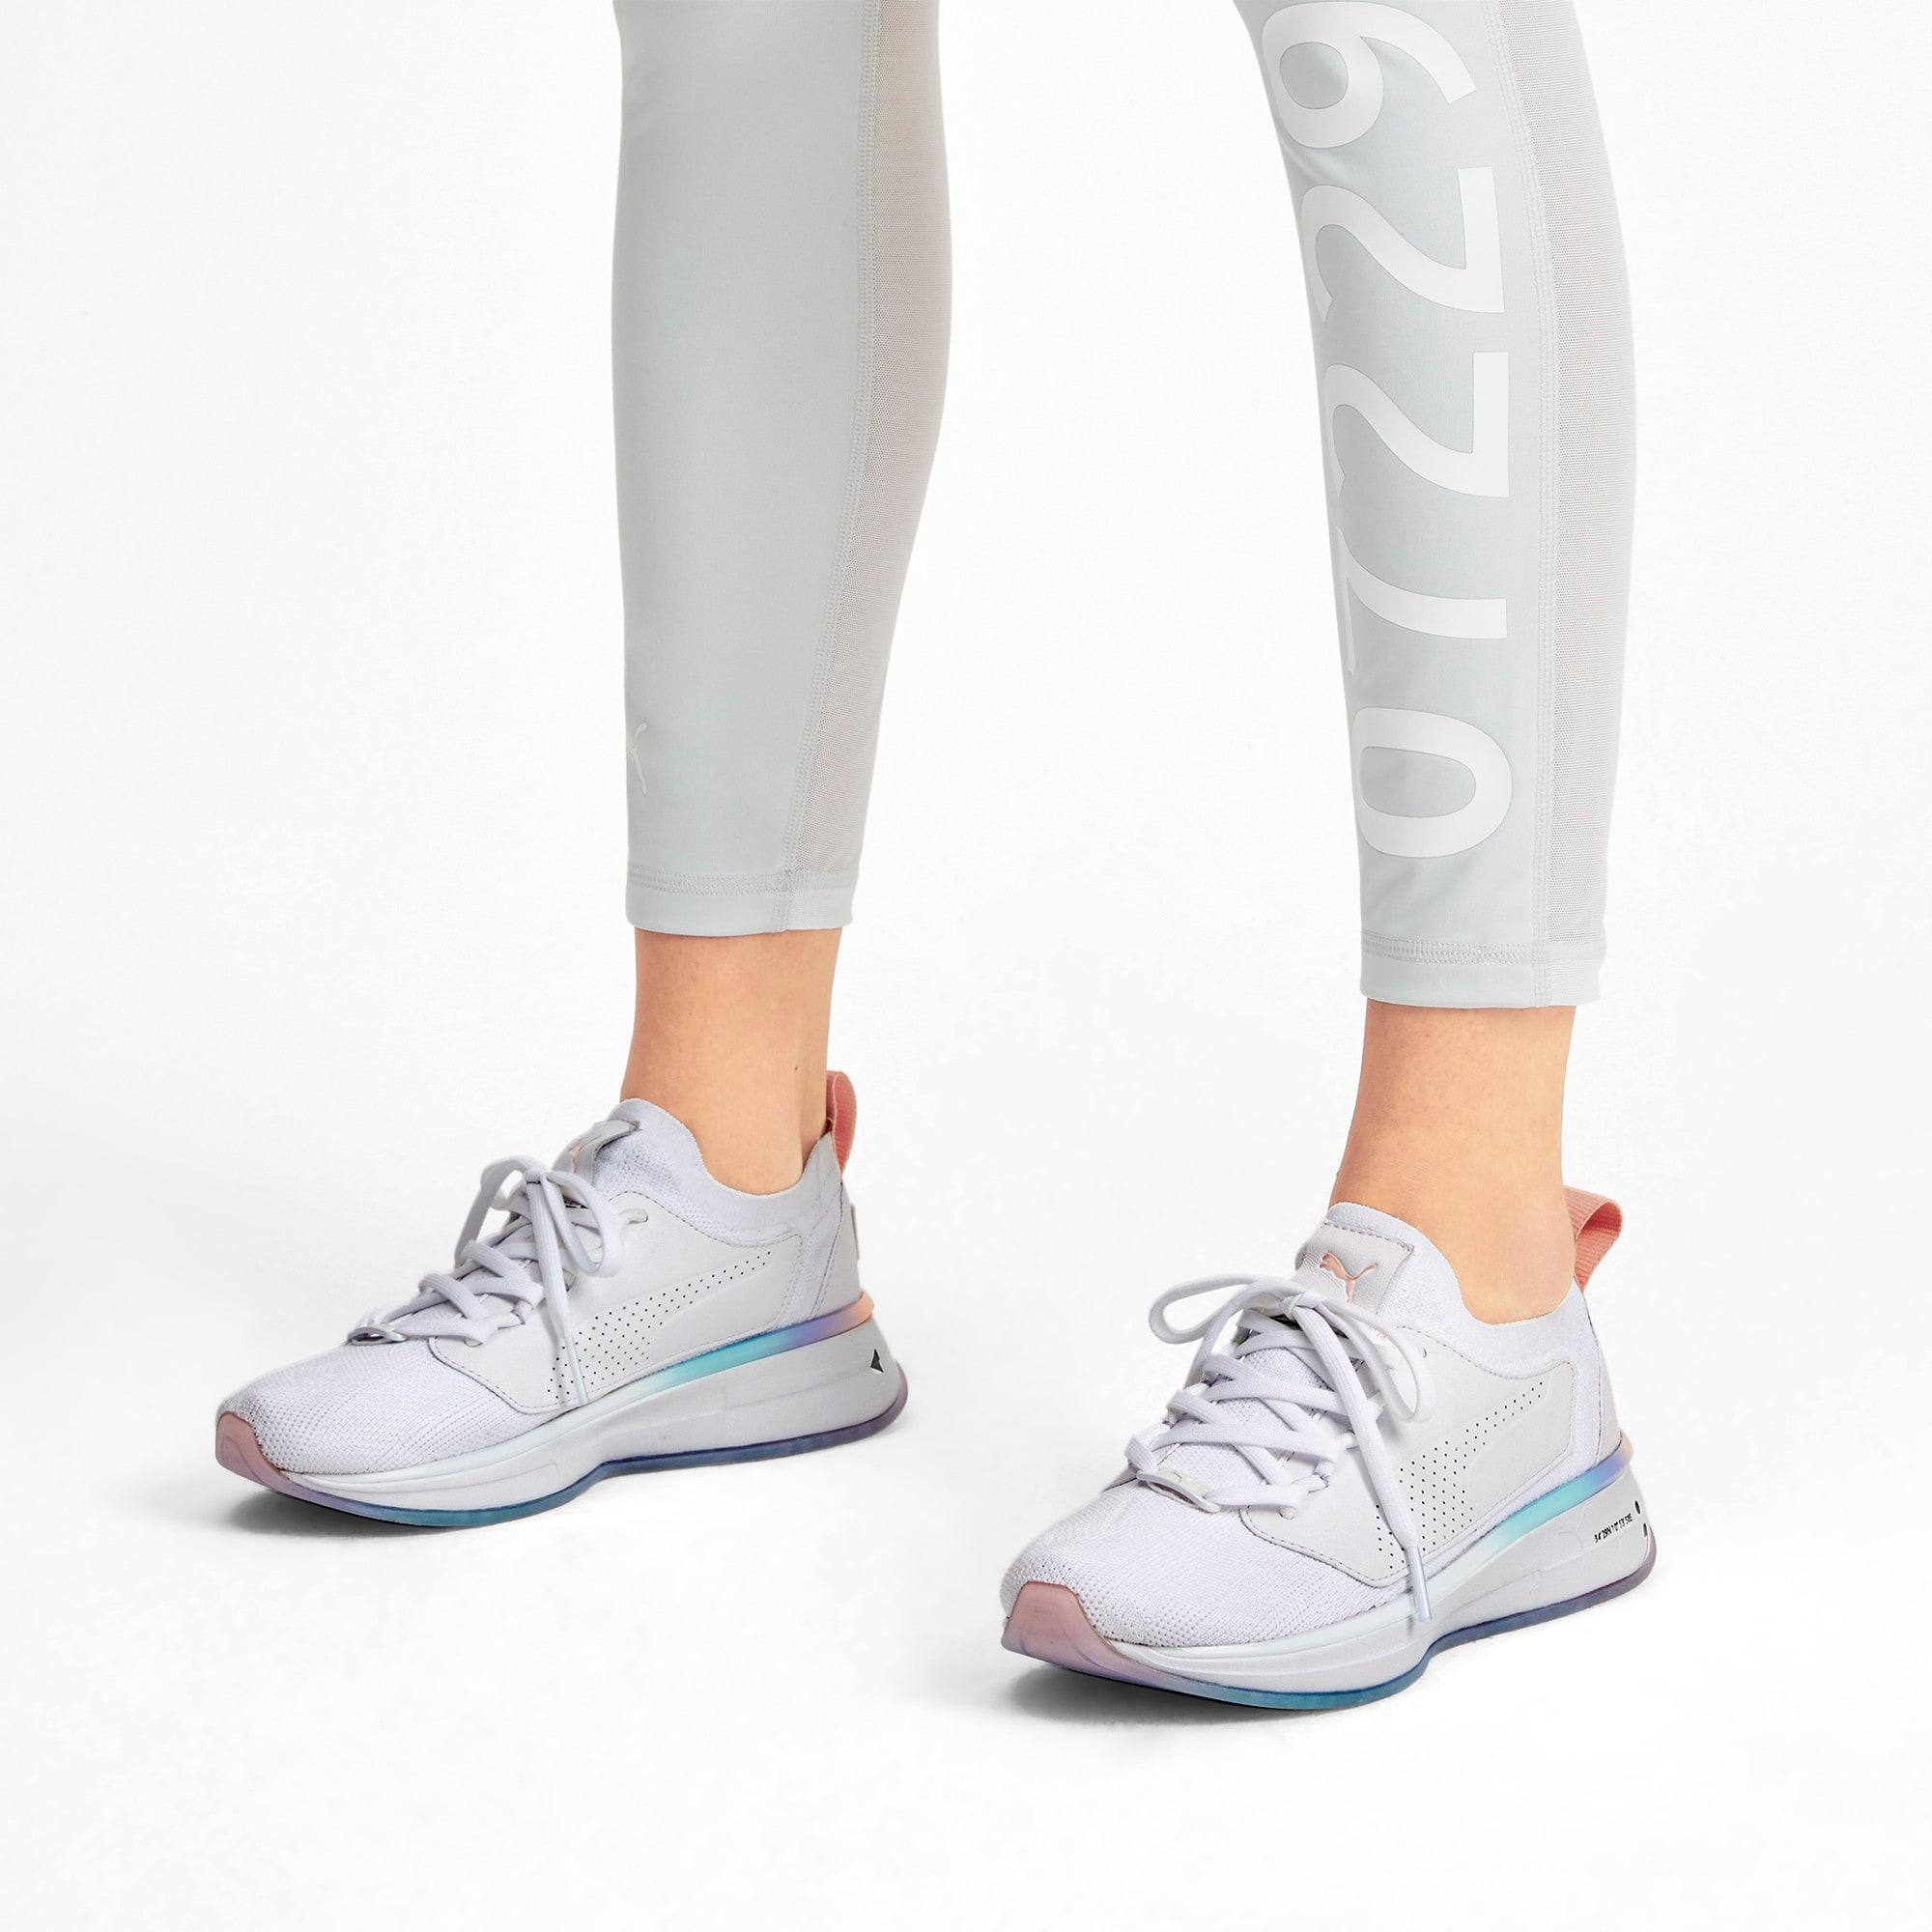 Miniatura 2 de Zapatos de entrenamiento SG Runner Ice para mujer, Puma White-Peach Bud, mediano